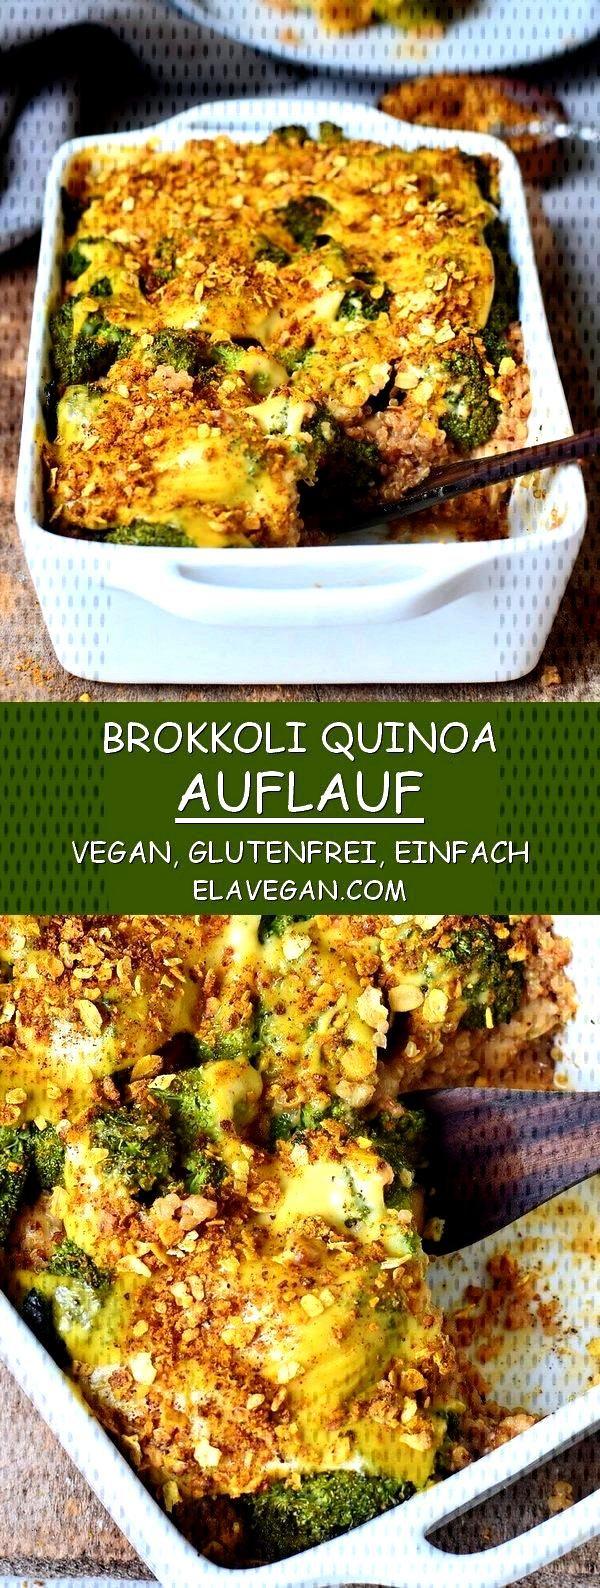 Broccoli bake (gratin) with quinoa and vegan cheese - Elavegan - Healthy broccoli quinoa casserole